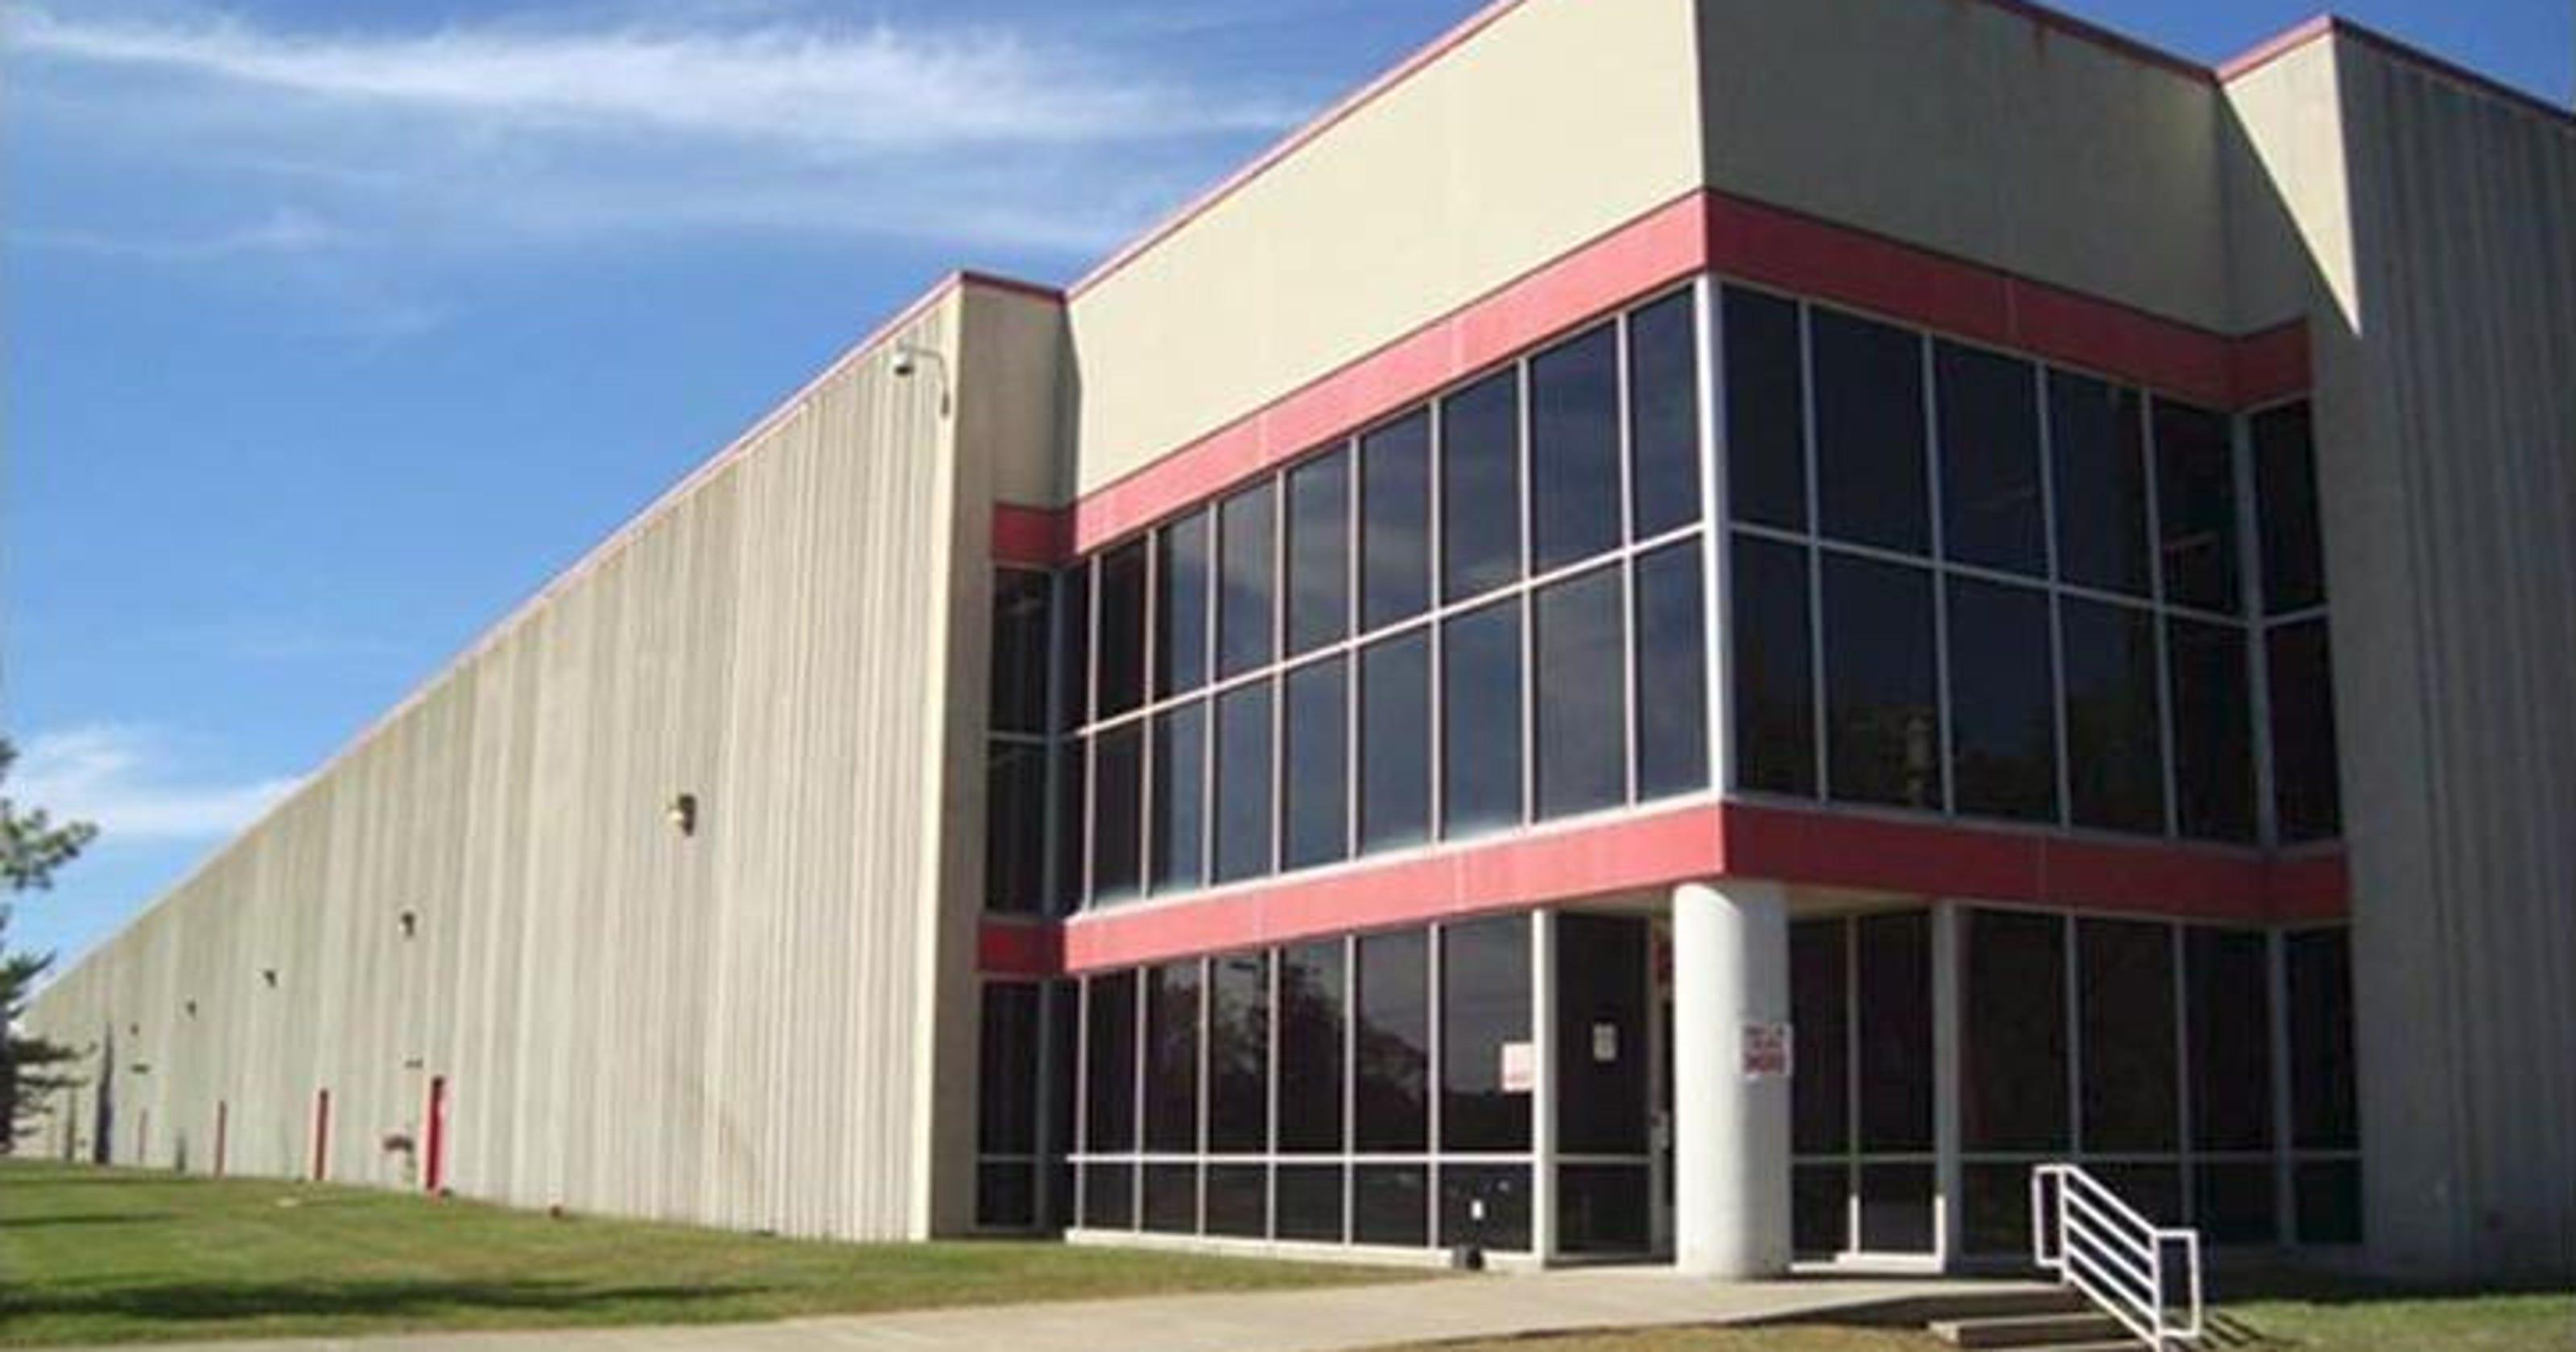 lighting maker in deal to buy major dutchess site